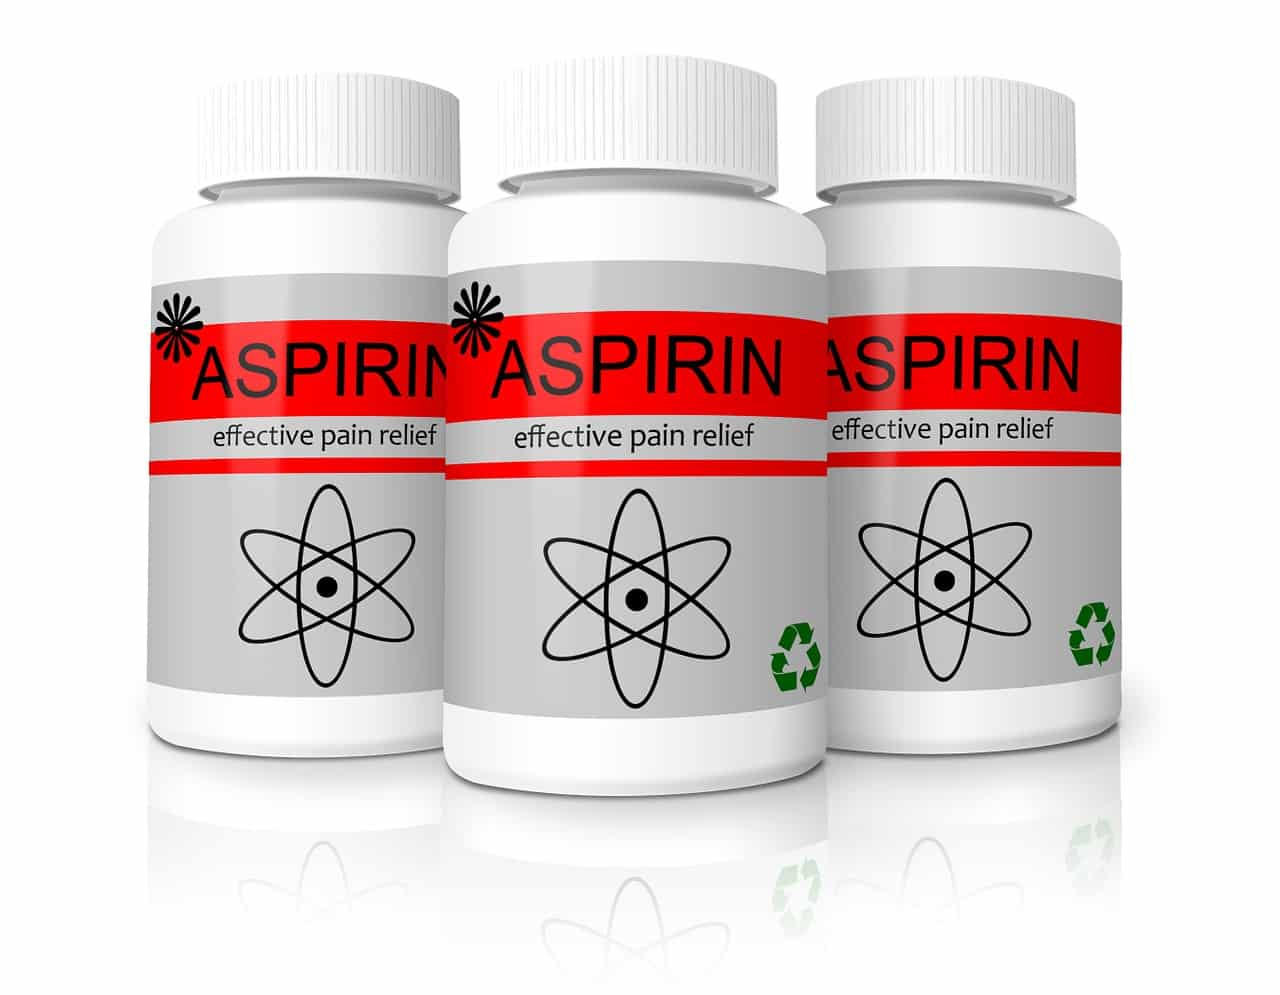 Aspirin.Prospect